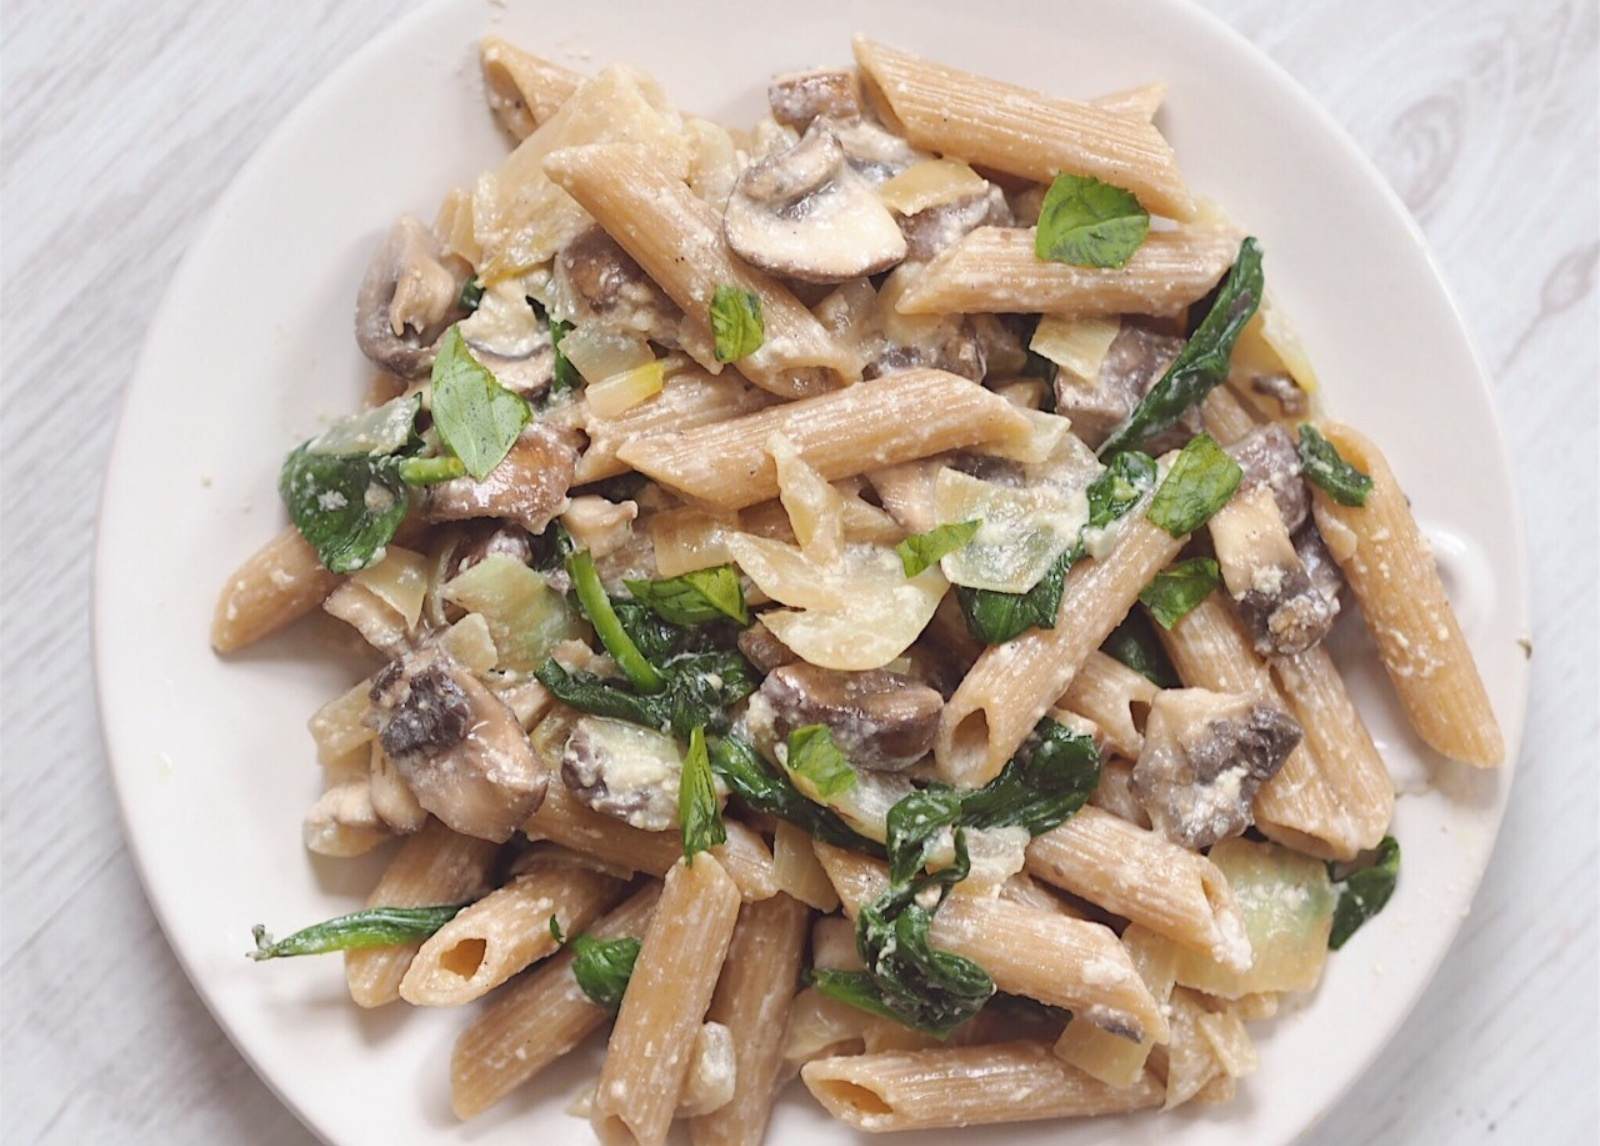 Vegan Creamy Mushroom and Herb Pasta